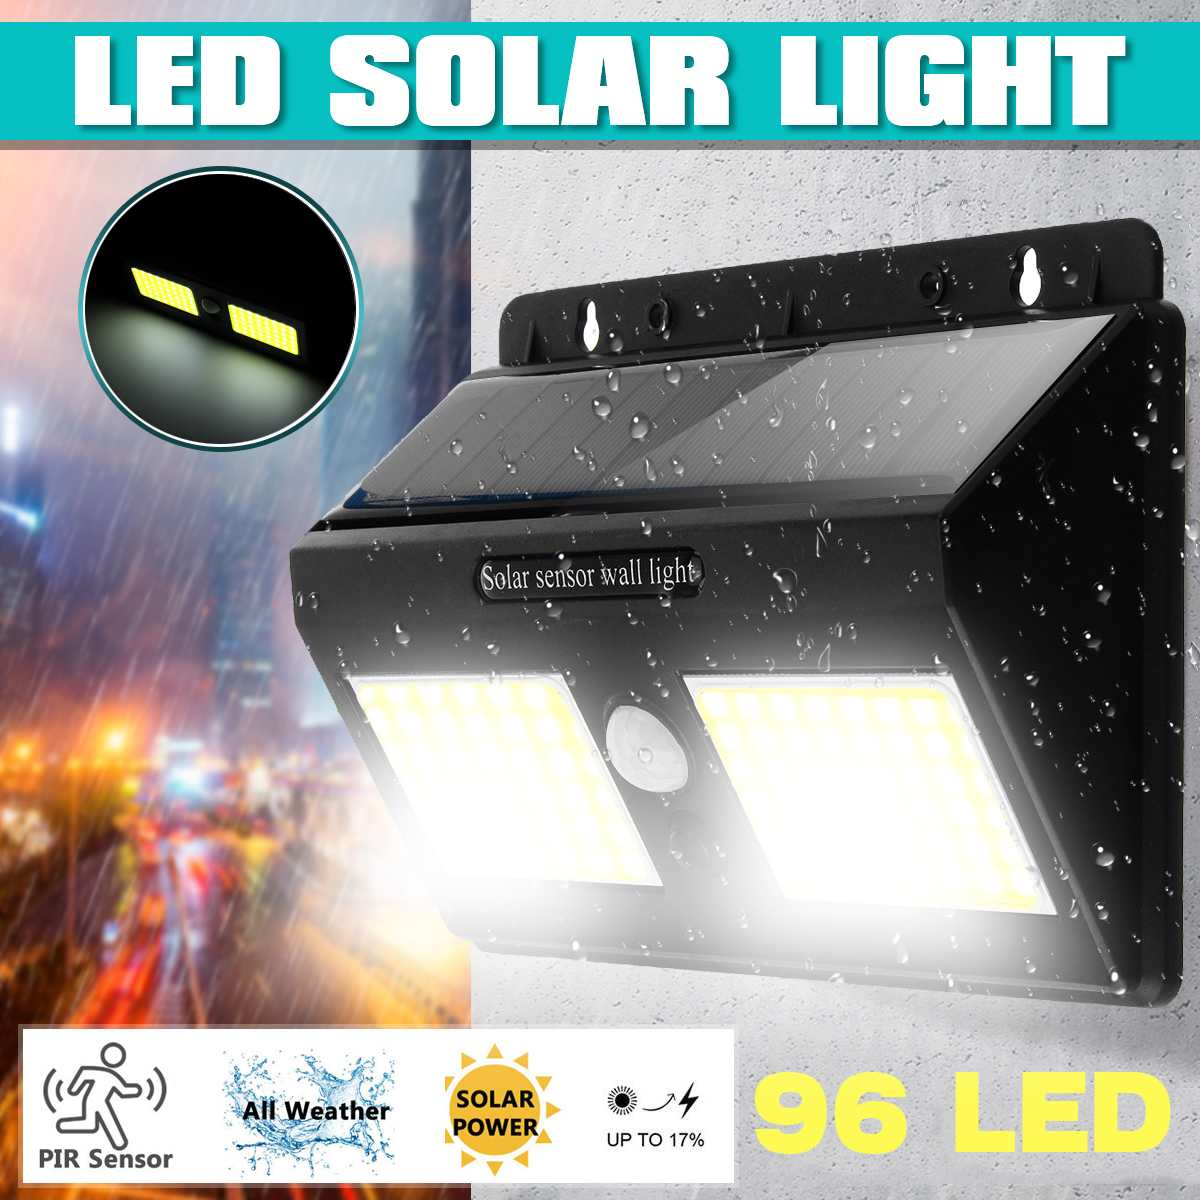 48/96 LED Solar Light Outdoor Solar Lamp Powered Sunlight Waterproof PIR Motion Sensor Street Light For Garden Decoration